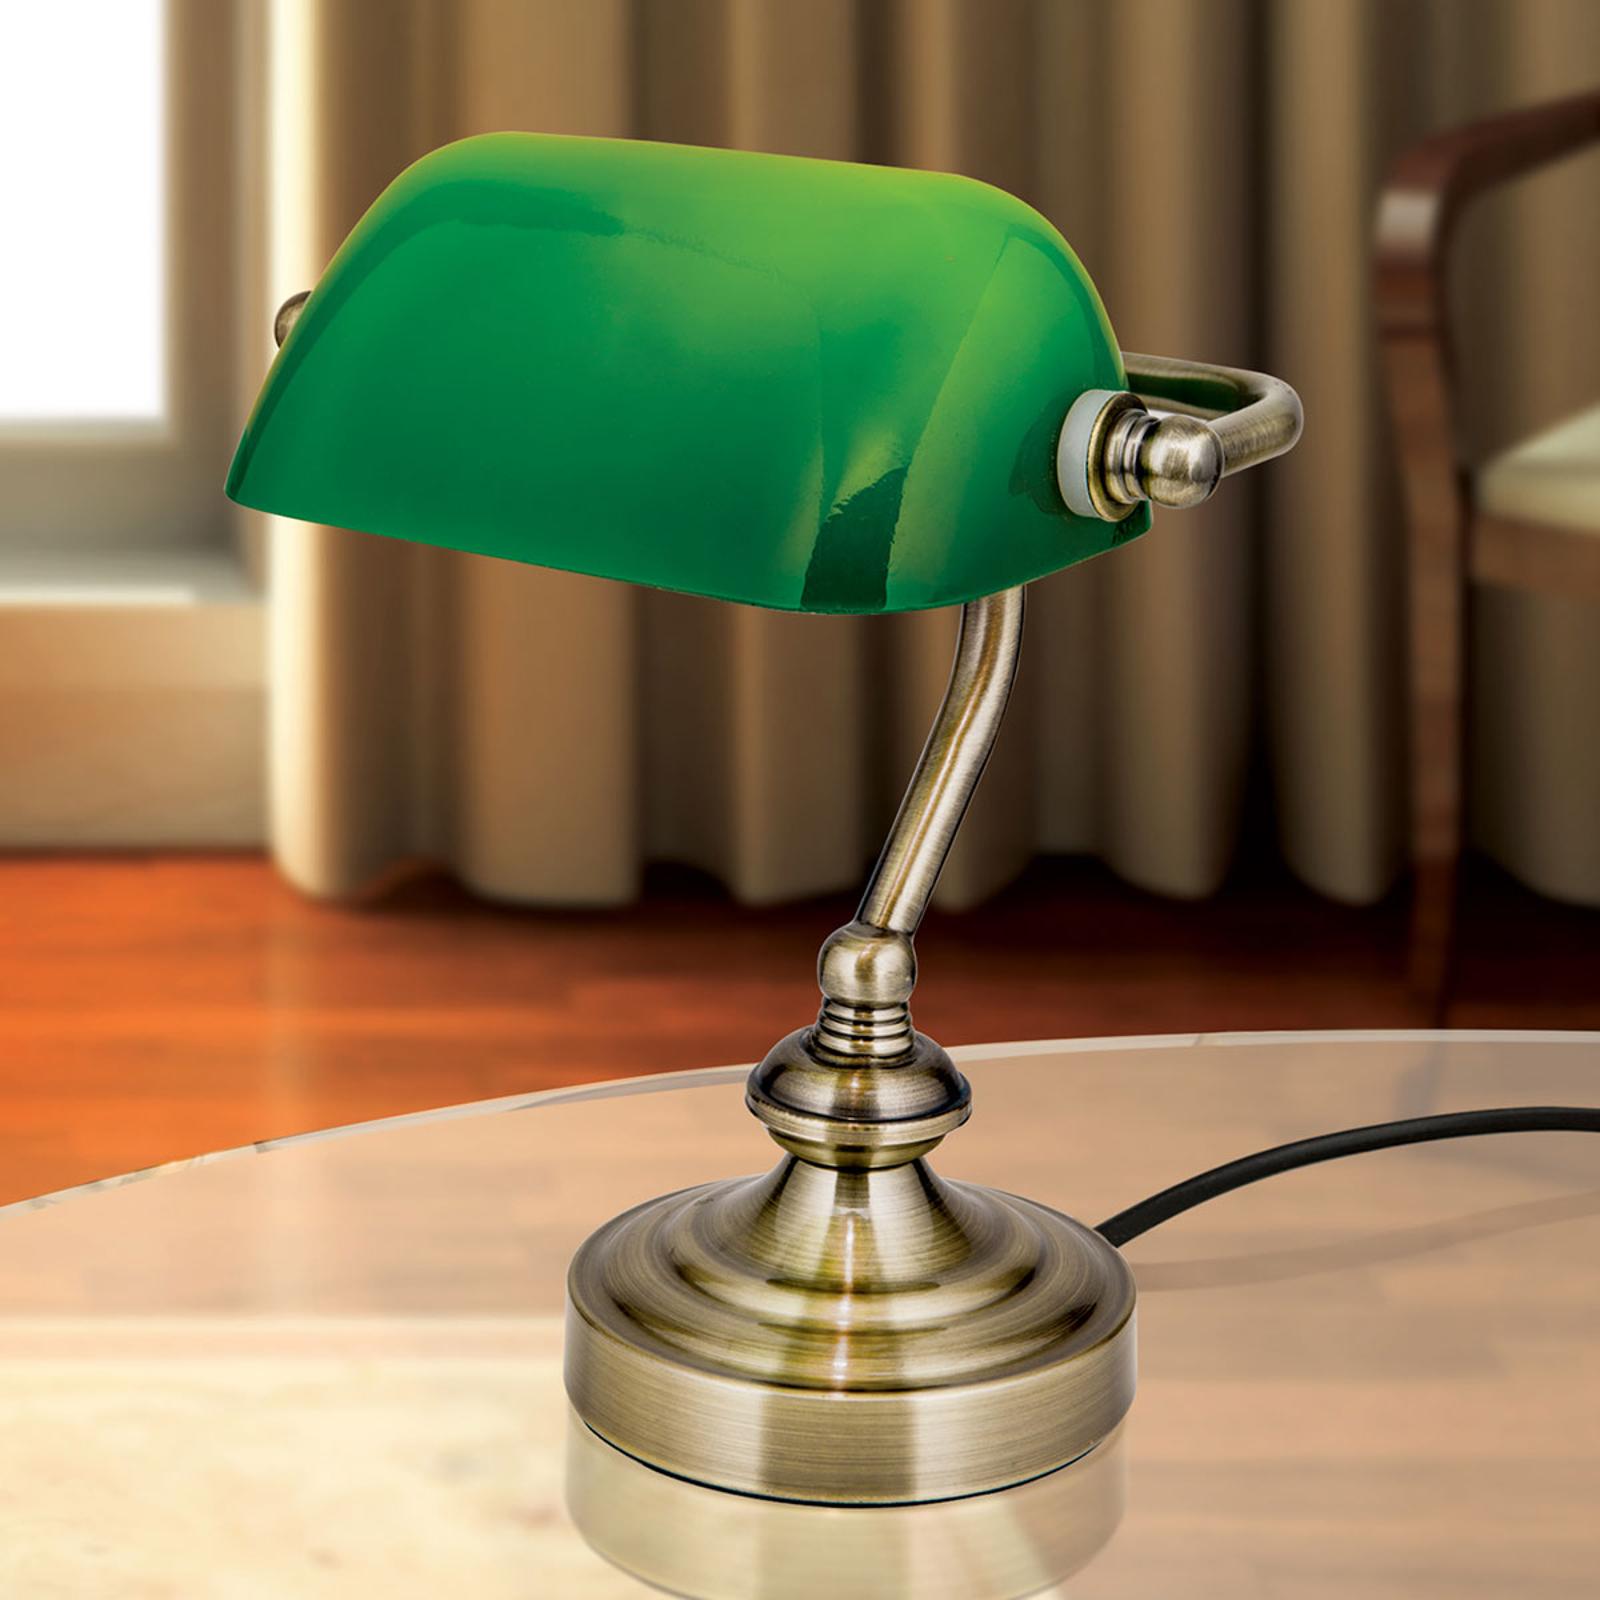 Zora – bankirlampa med grön glasskärm